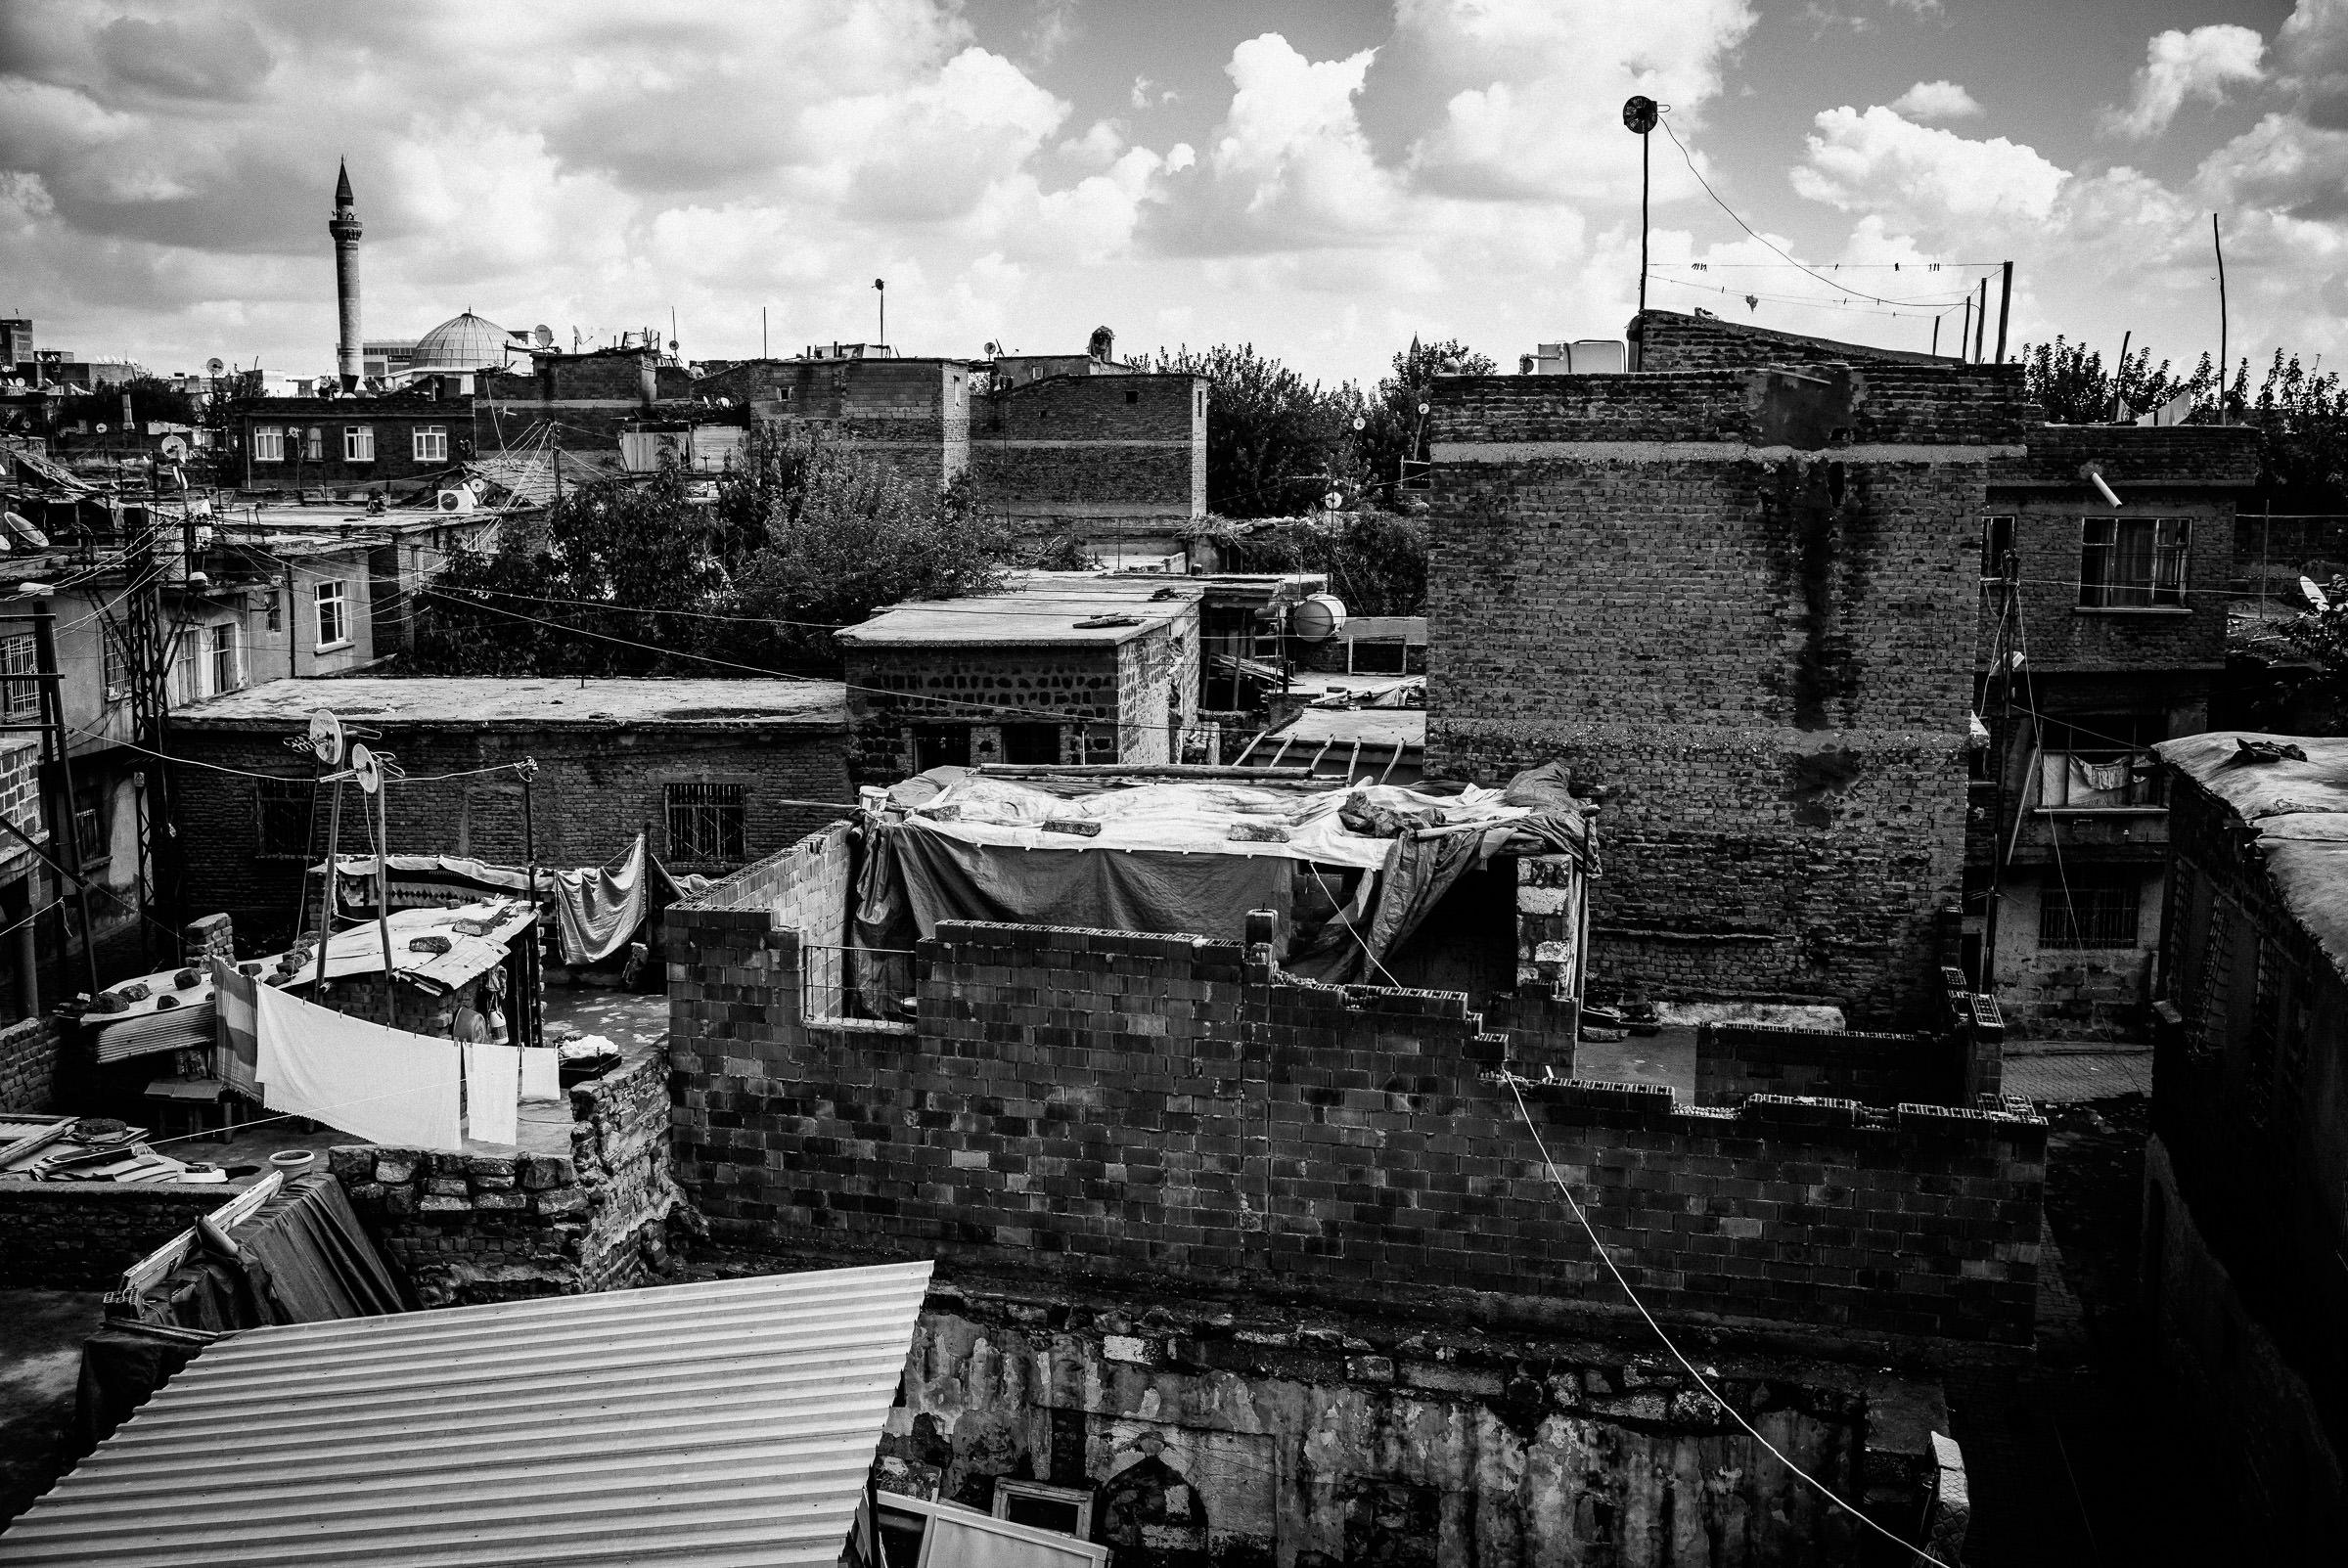 brandon_patoc_travel_photographer_in_turkey_0005.jpg